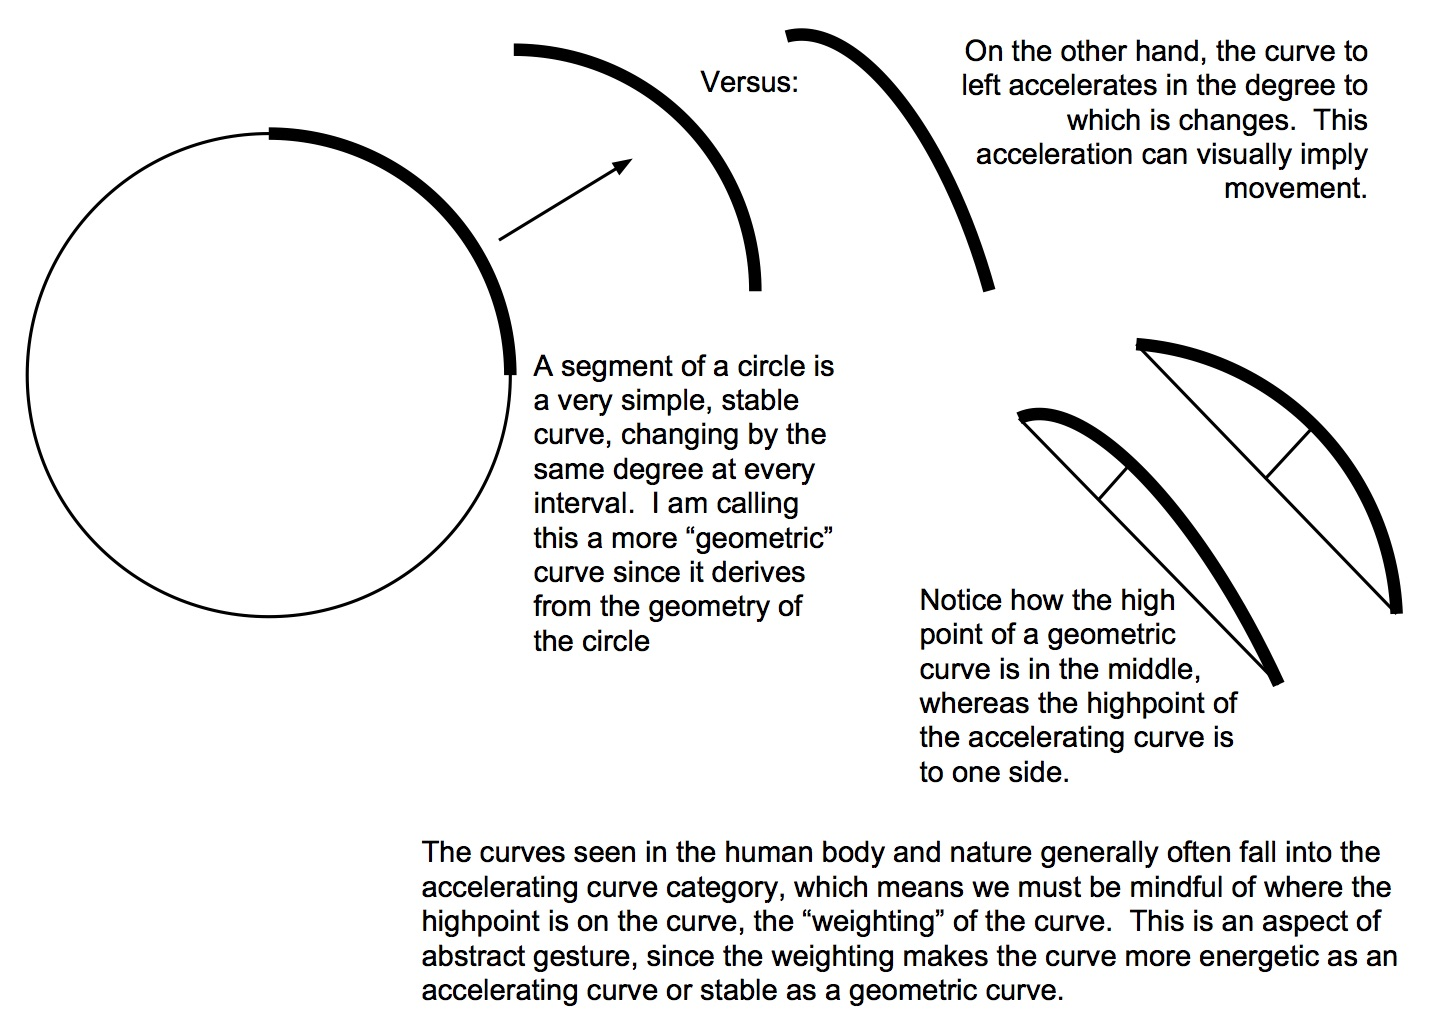 Geometric vs accelerating curves (1).jpg